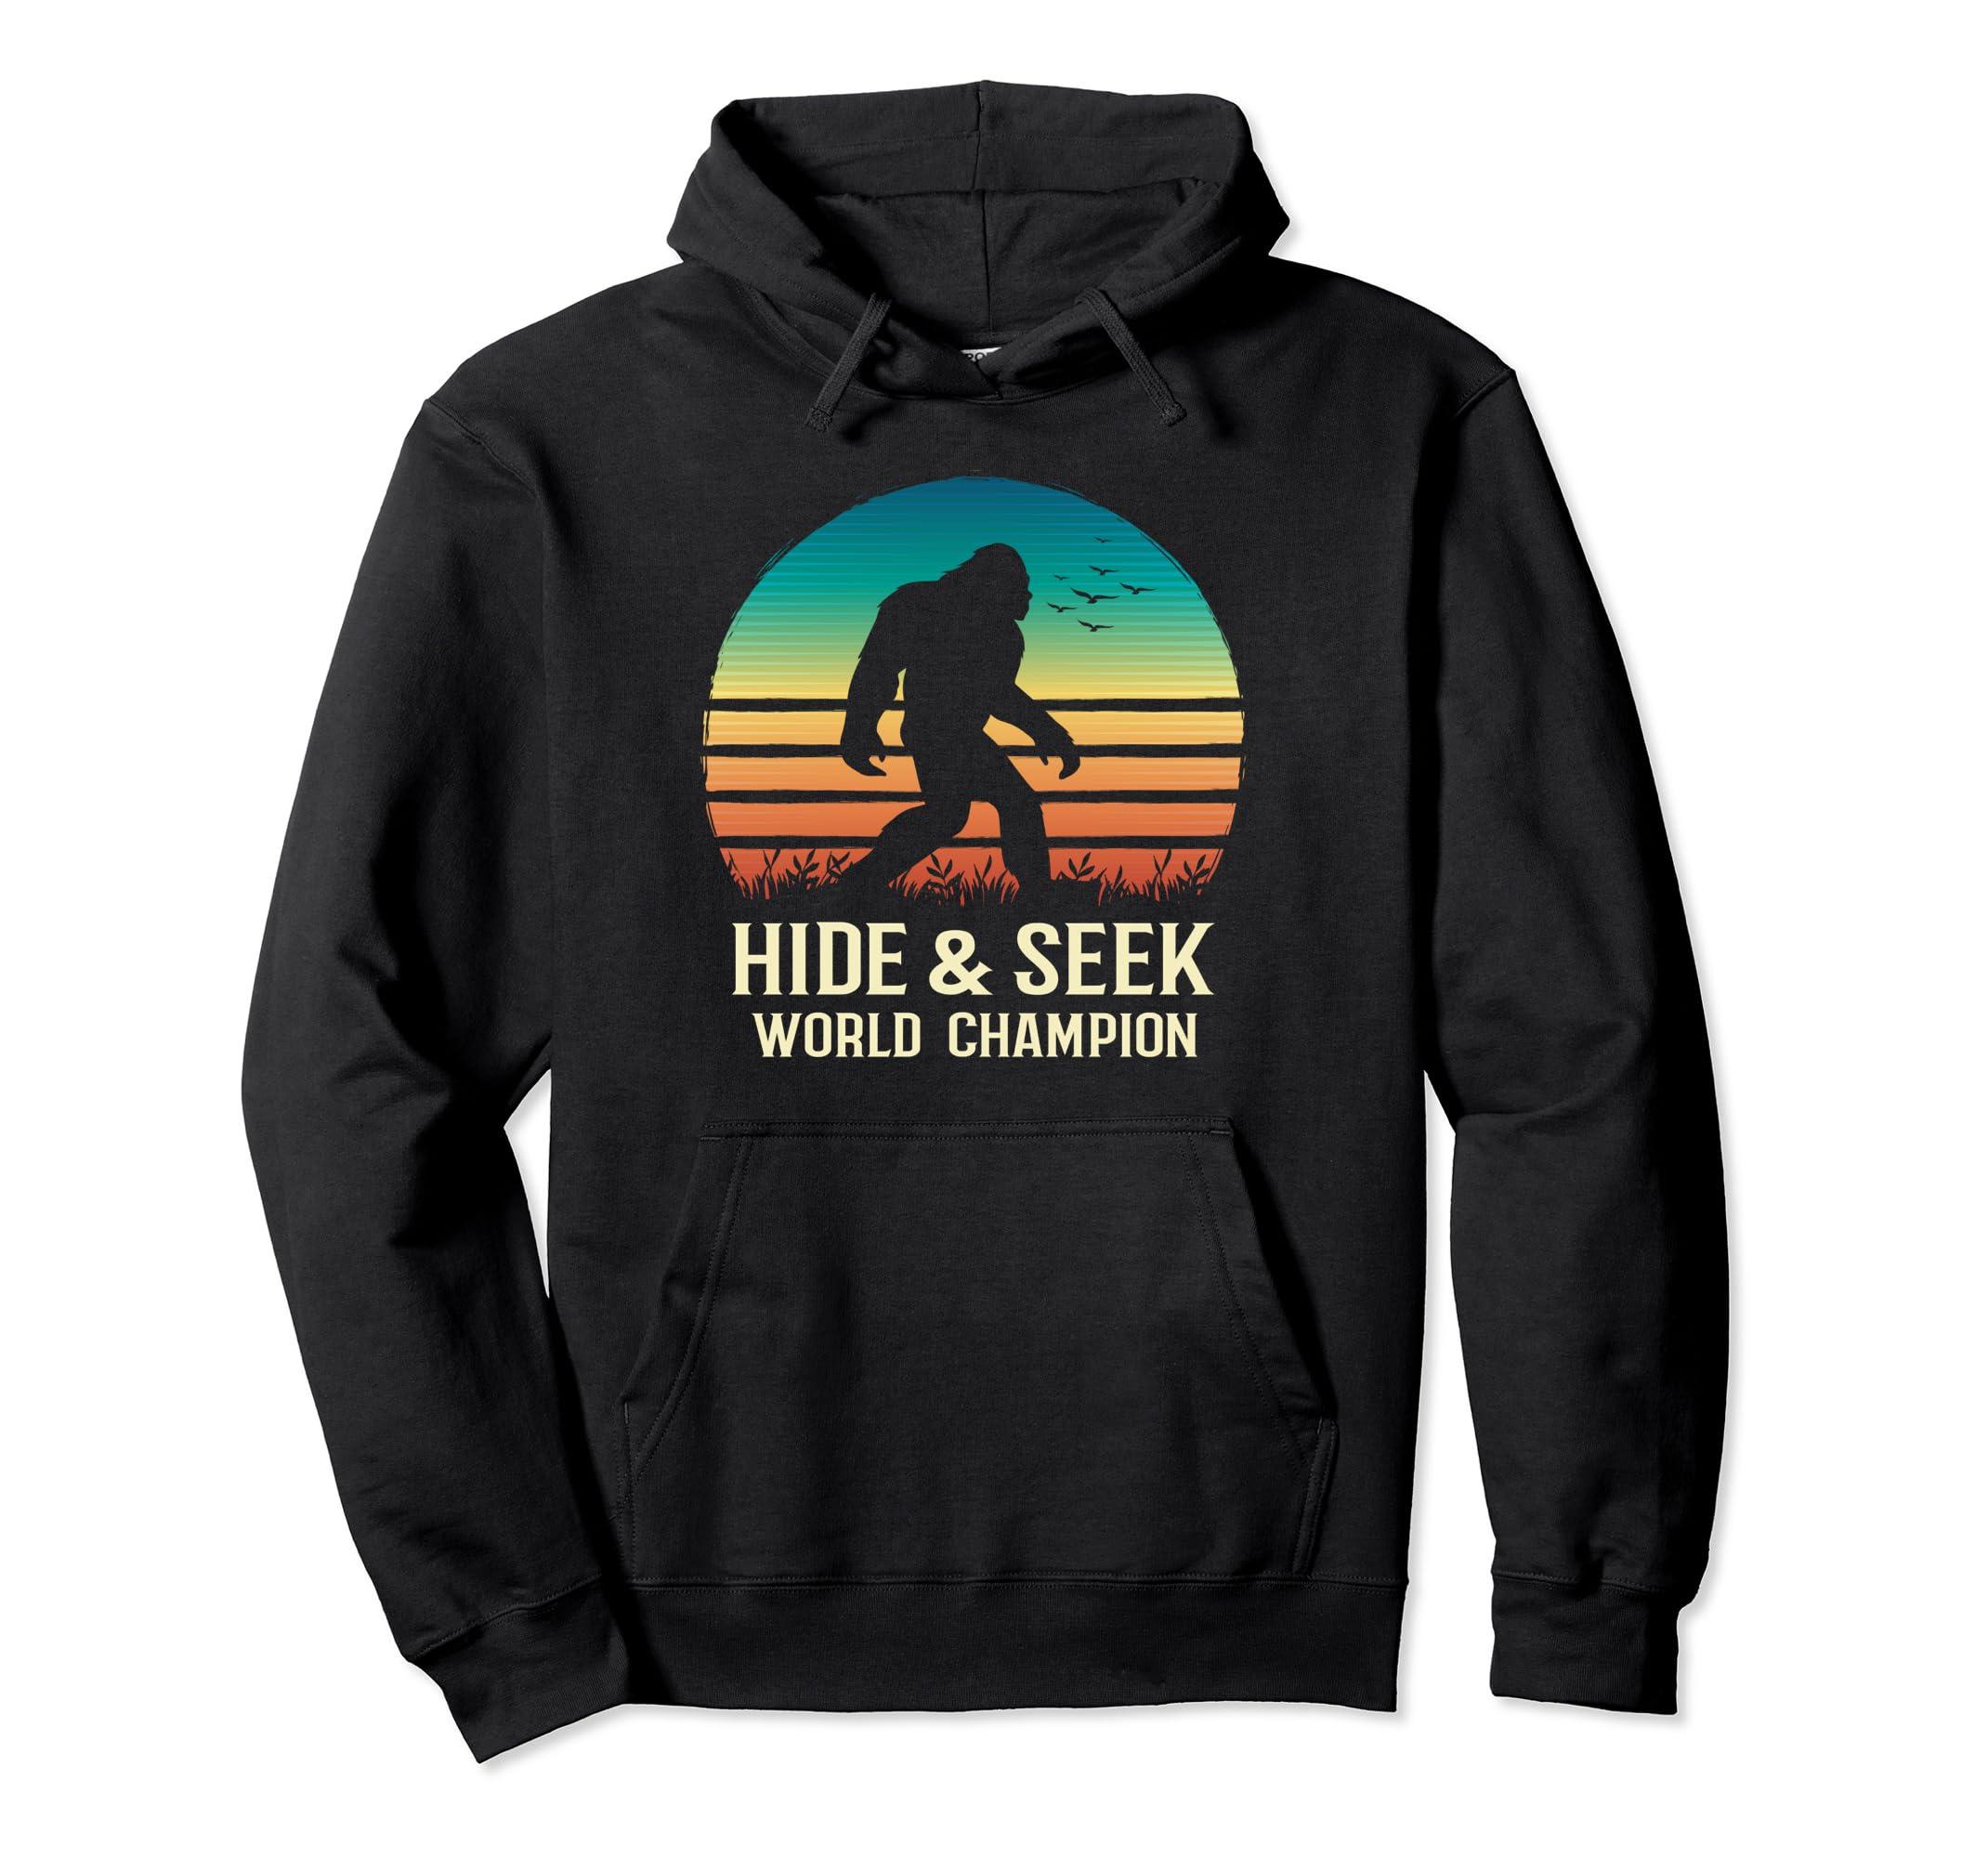 2c07e7b8c Amazon.com: Hide and Seek World Champion Hoodie Vintage Bigfoot Believe:  Clothing